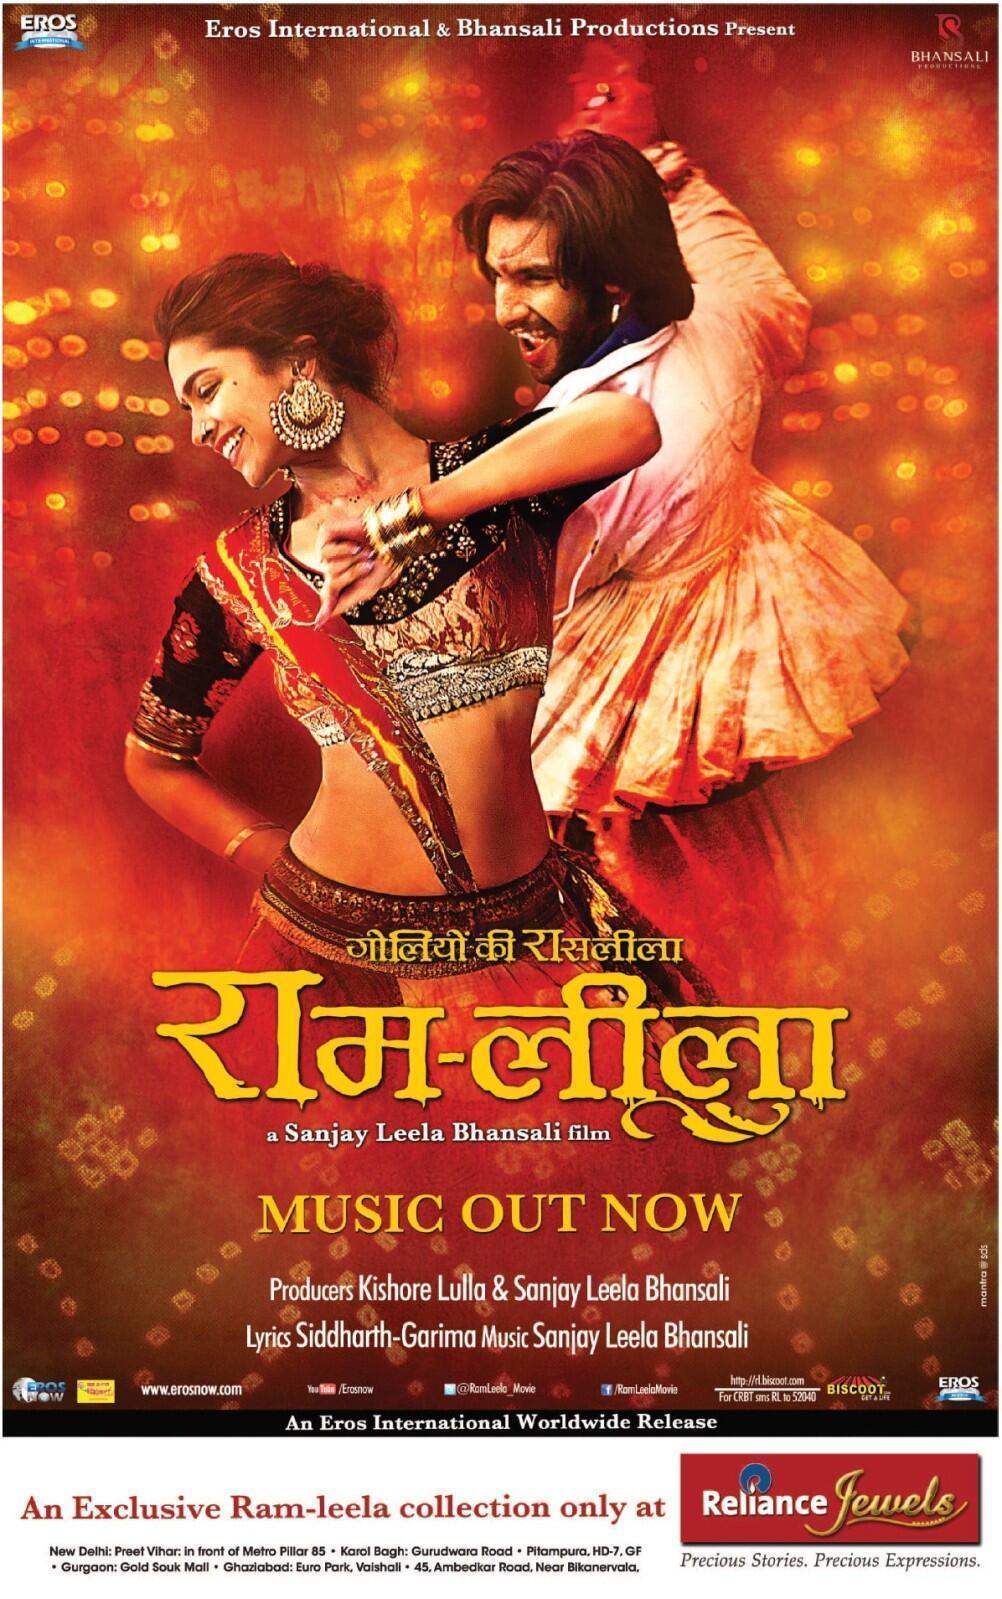 Bollywoodske plagáty - Stránka 7 Tumblr_mu8jlxTMig1rkmob2o1_1280